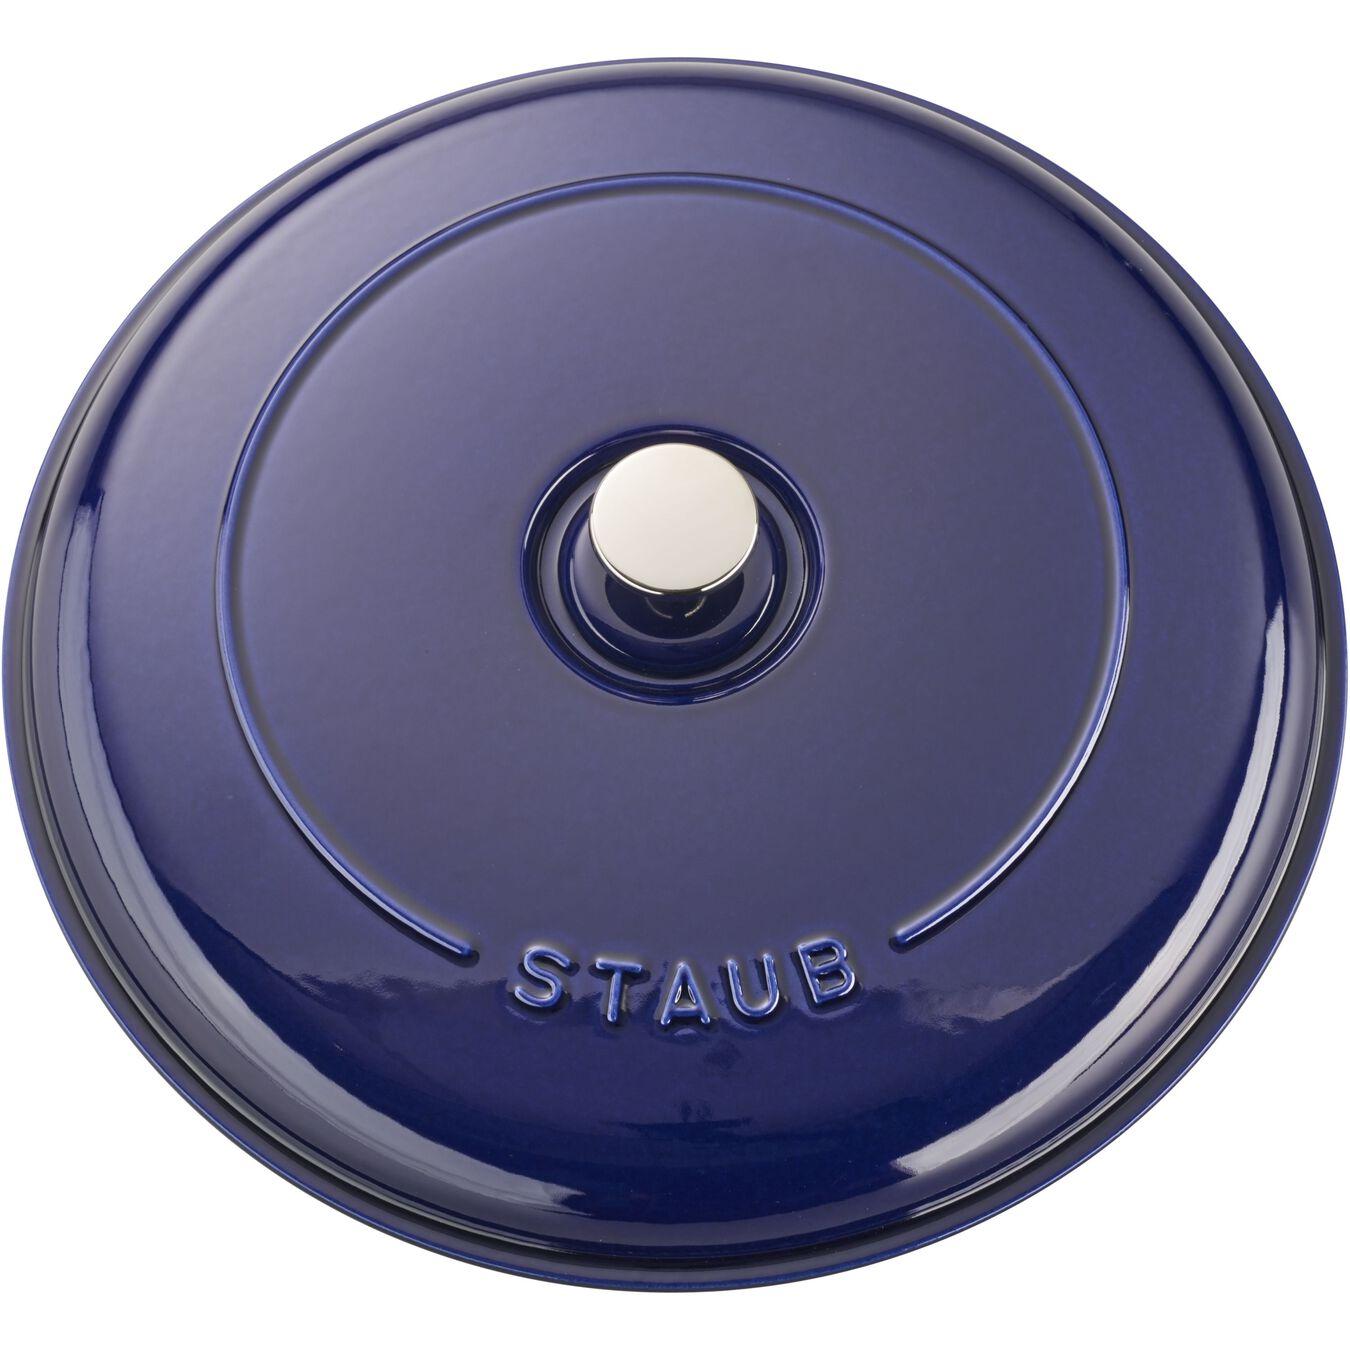 3.5 l round Saute pan, dark-blue,,large 3